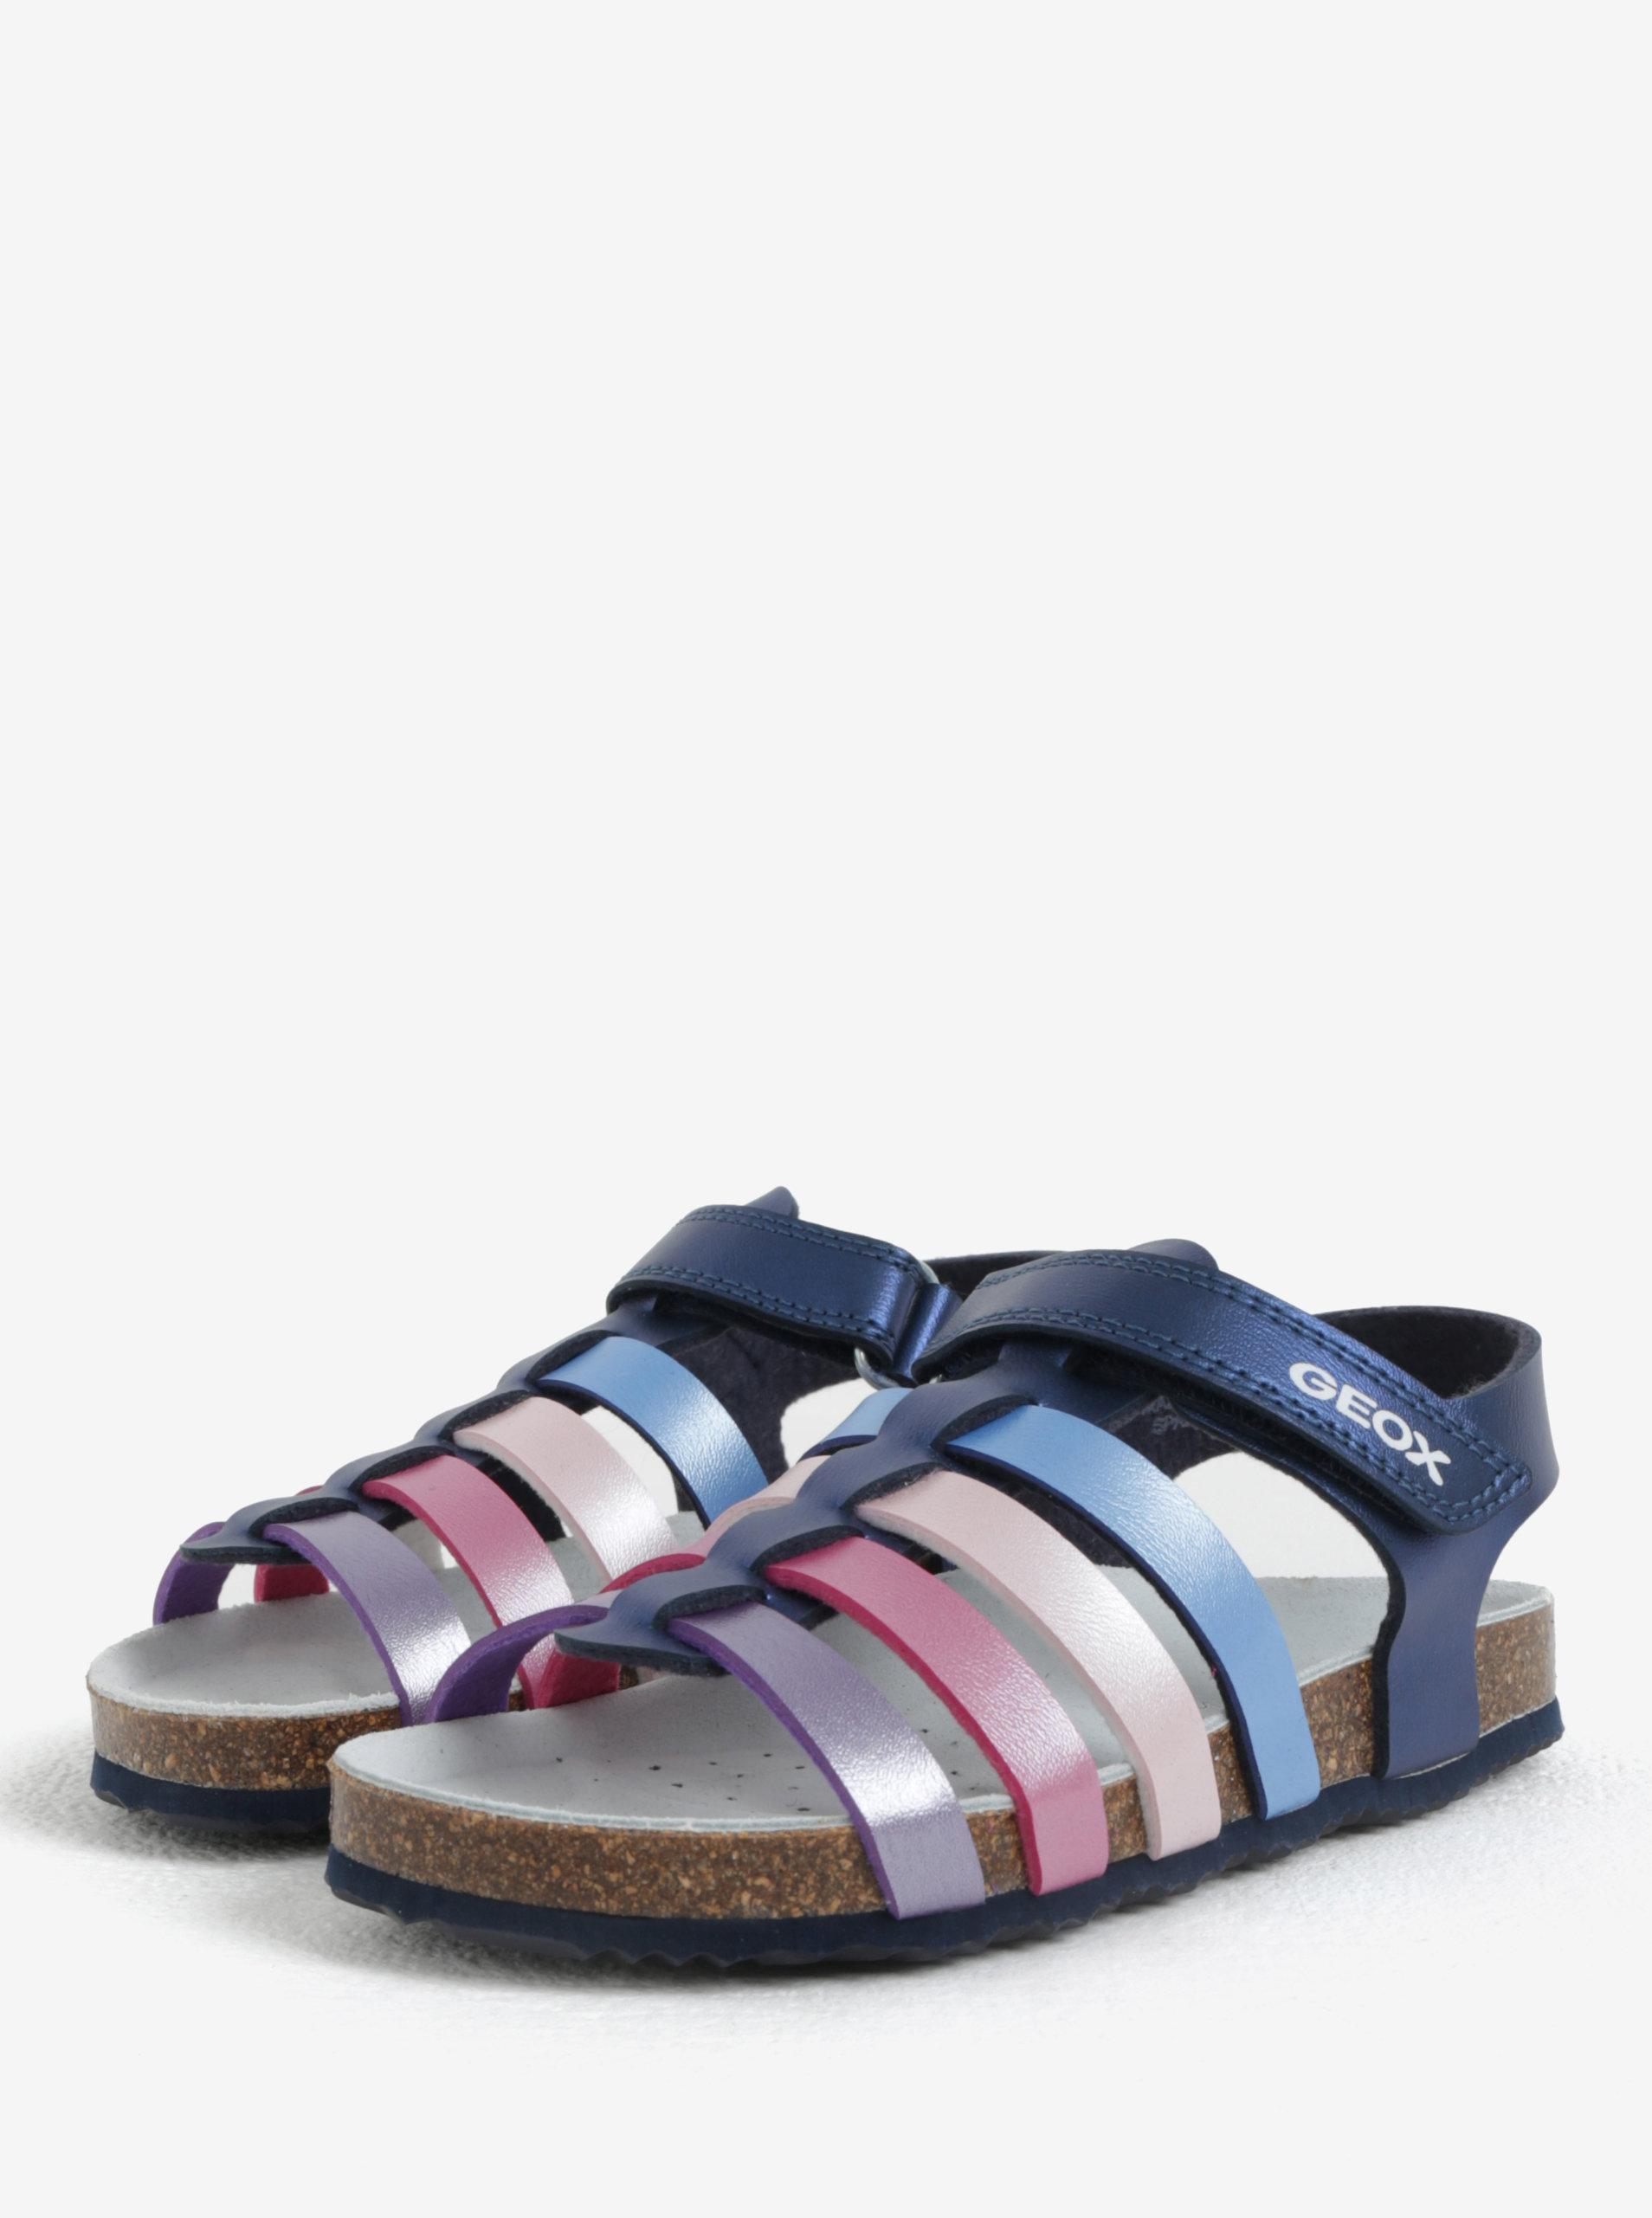 83c72134ddd3 Tmavomodré dievčenské kožené sandále Geox ...